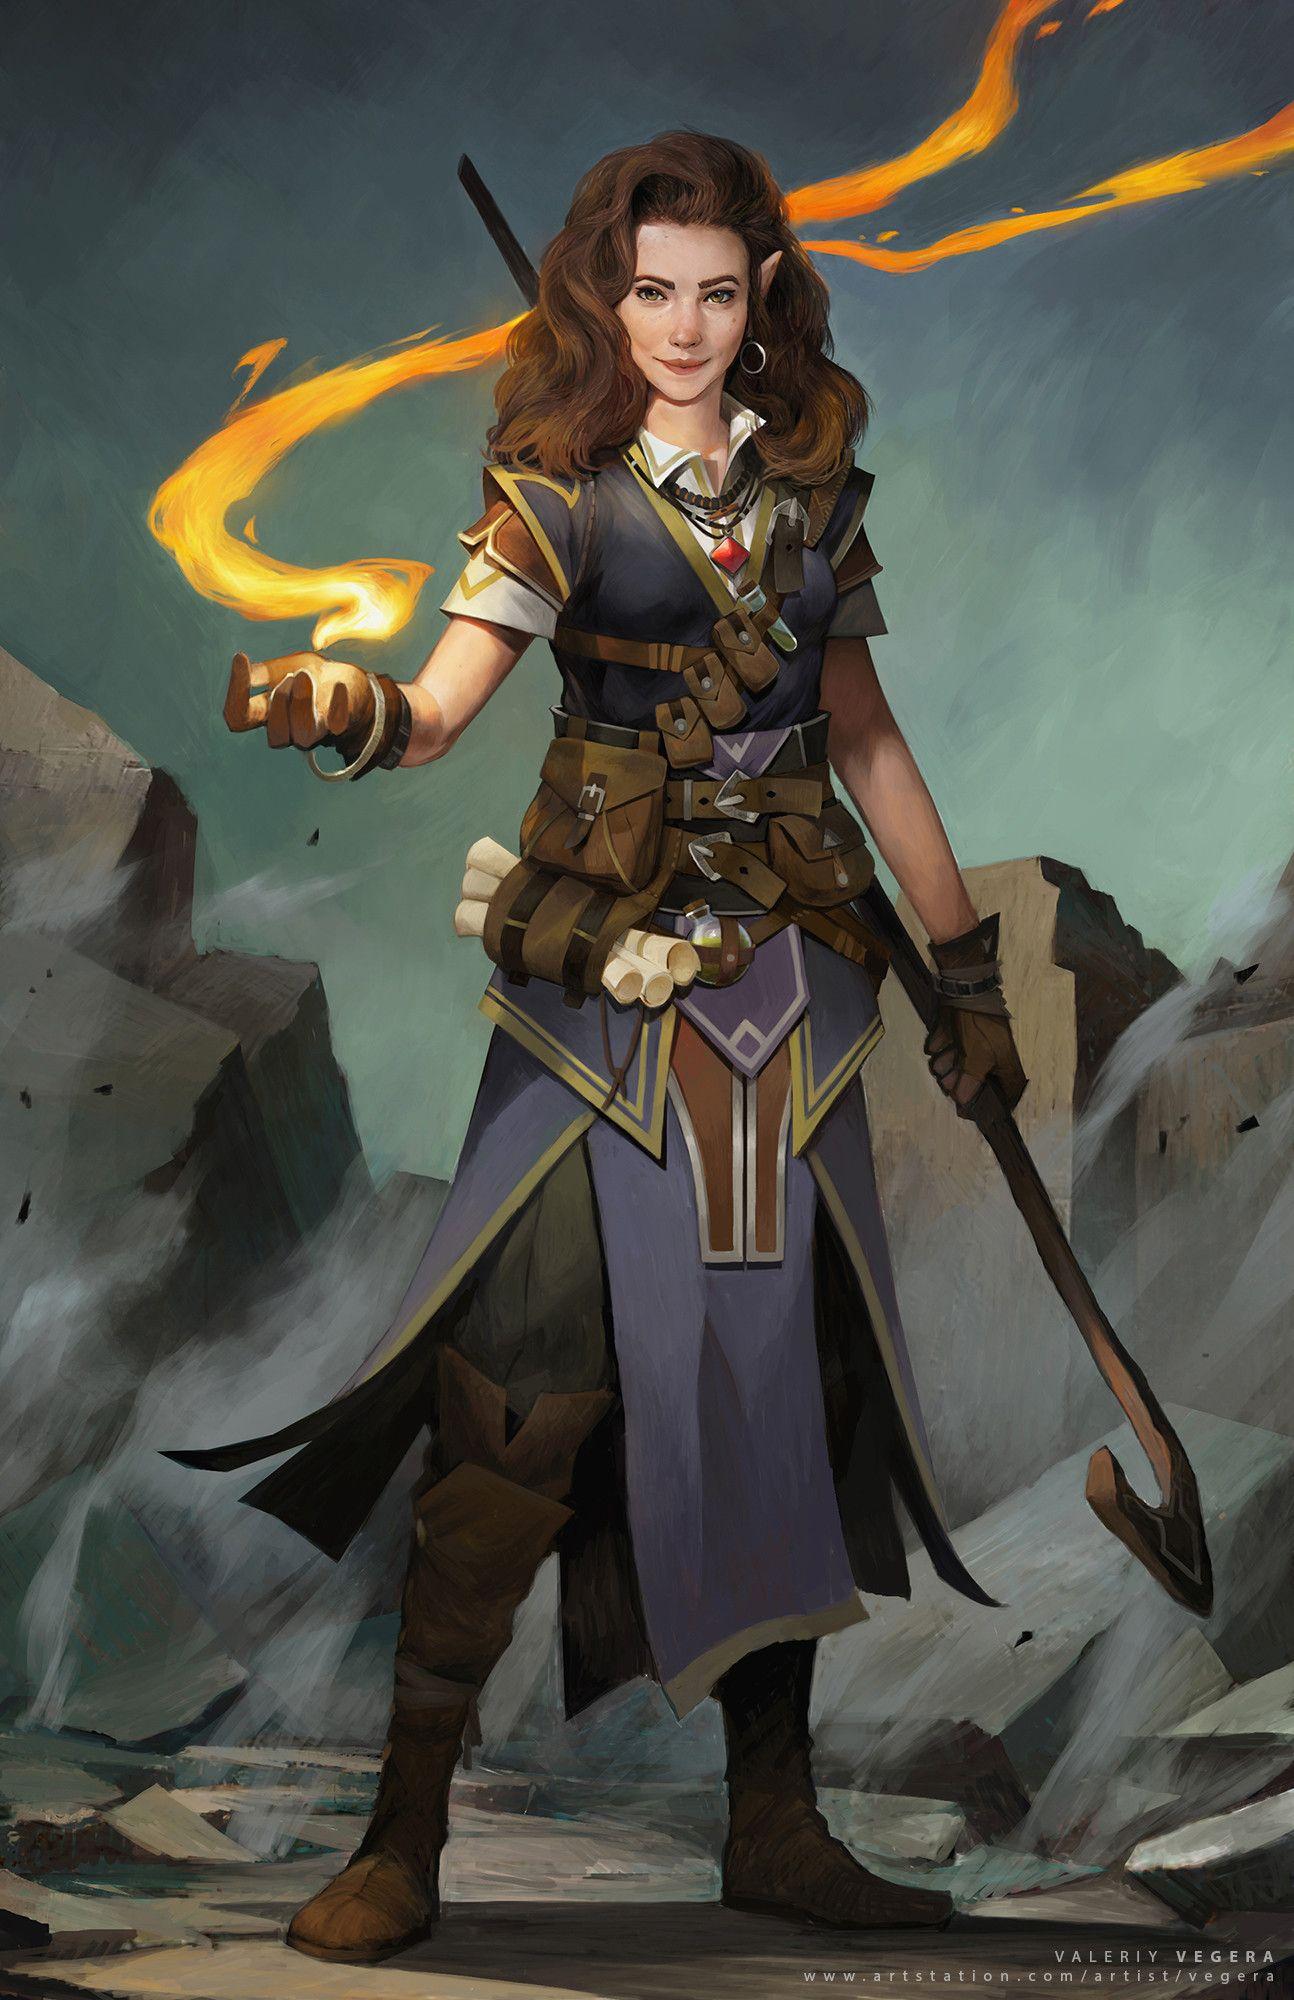 Characters for Pathfinder: Kingmaker Owlcat Games by Valeriy